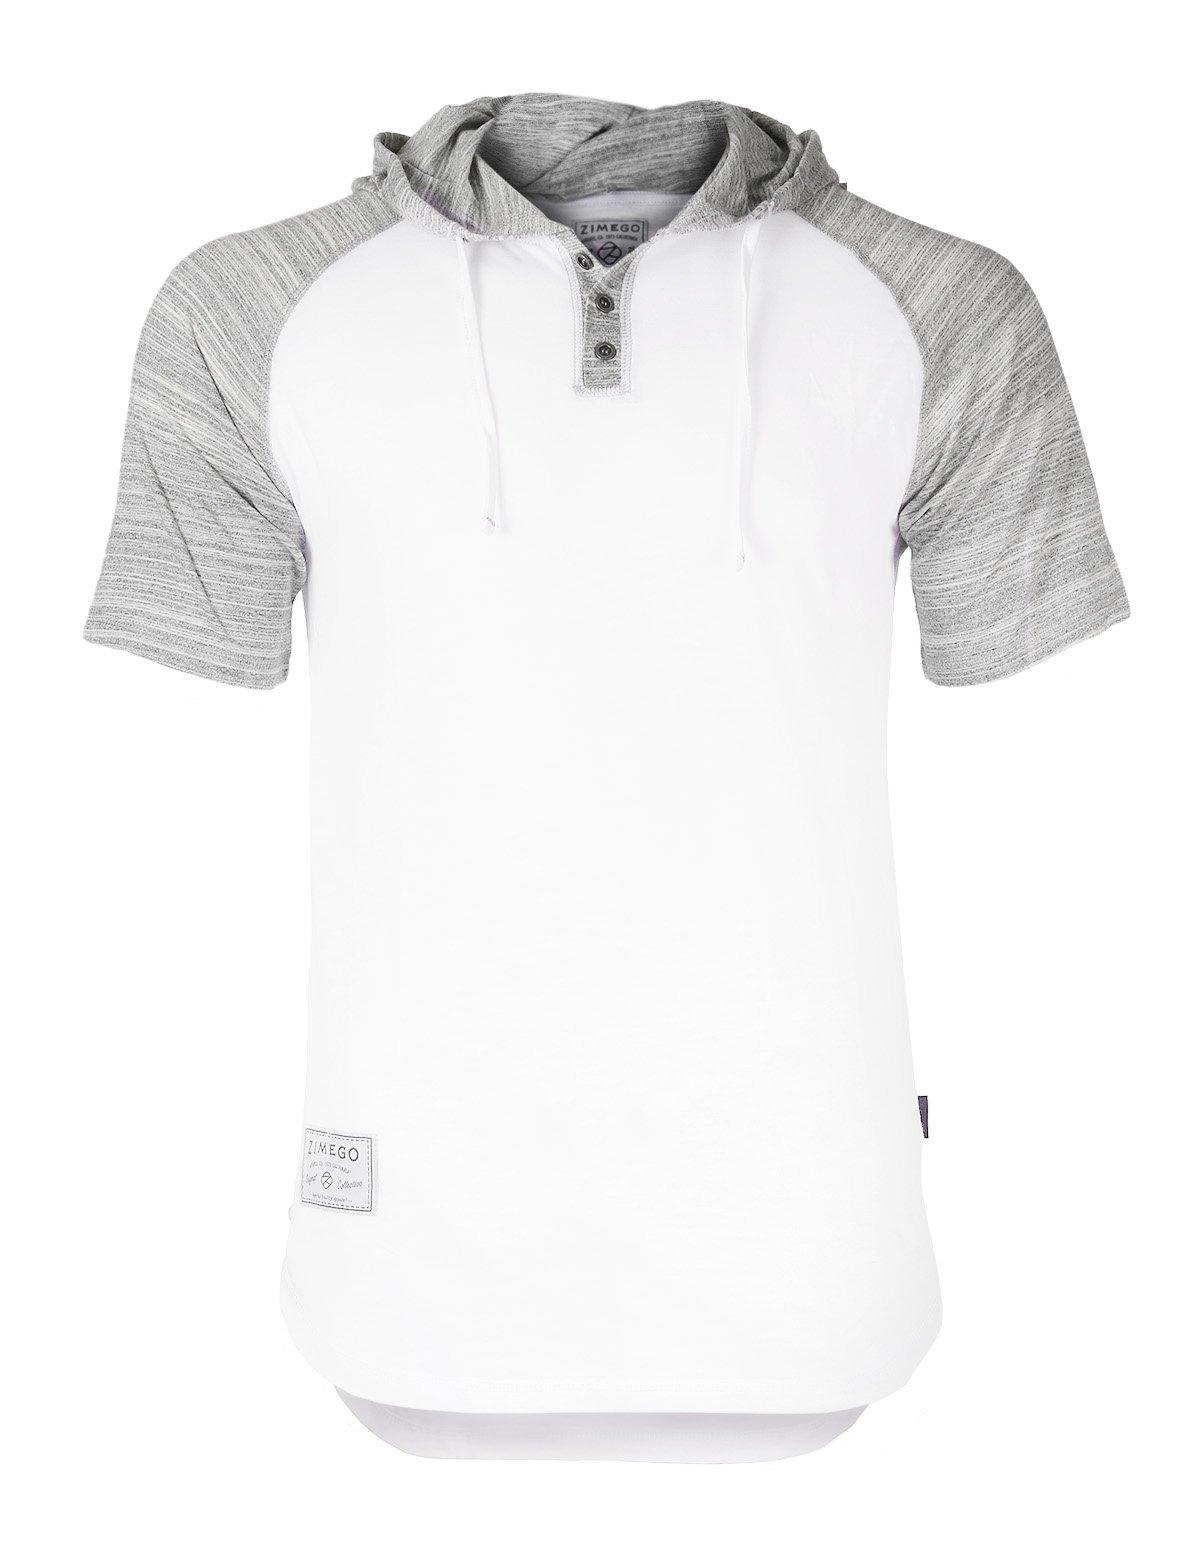 ZIMEGO Short Sleeve Raglan Henley Hoodie Round Bottom Semi Longline T-Shirt (XX-Large, White Fulfilled by